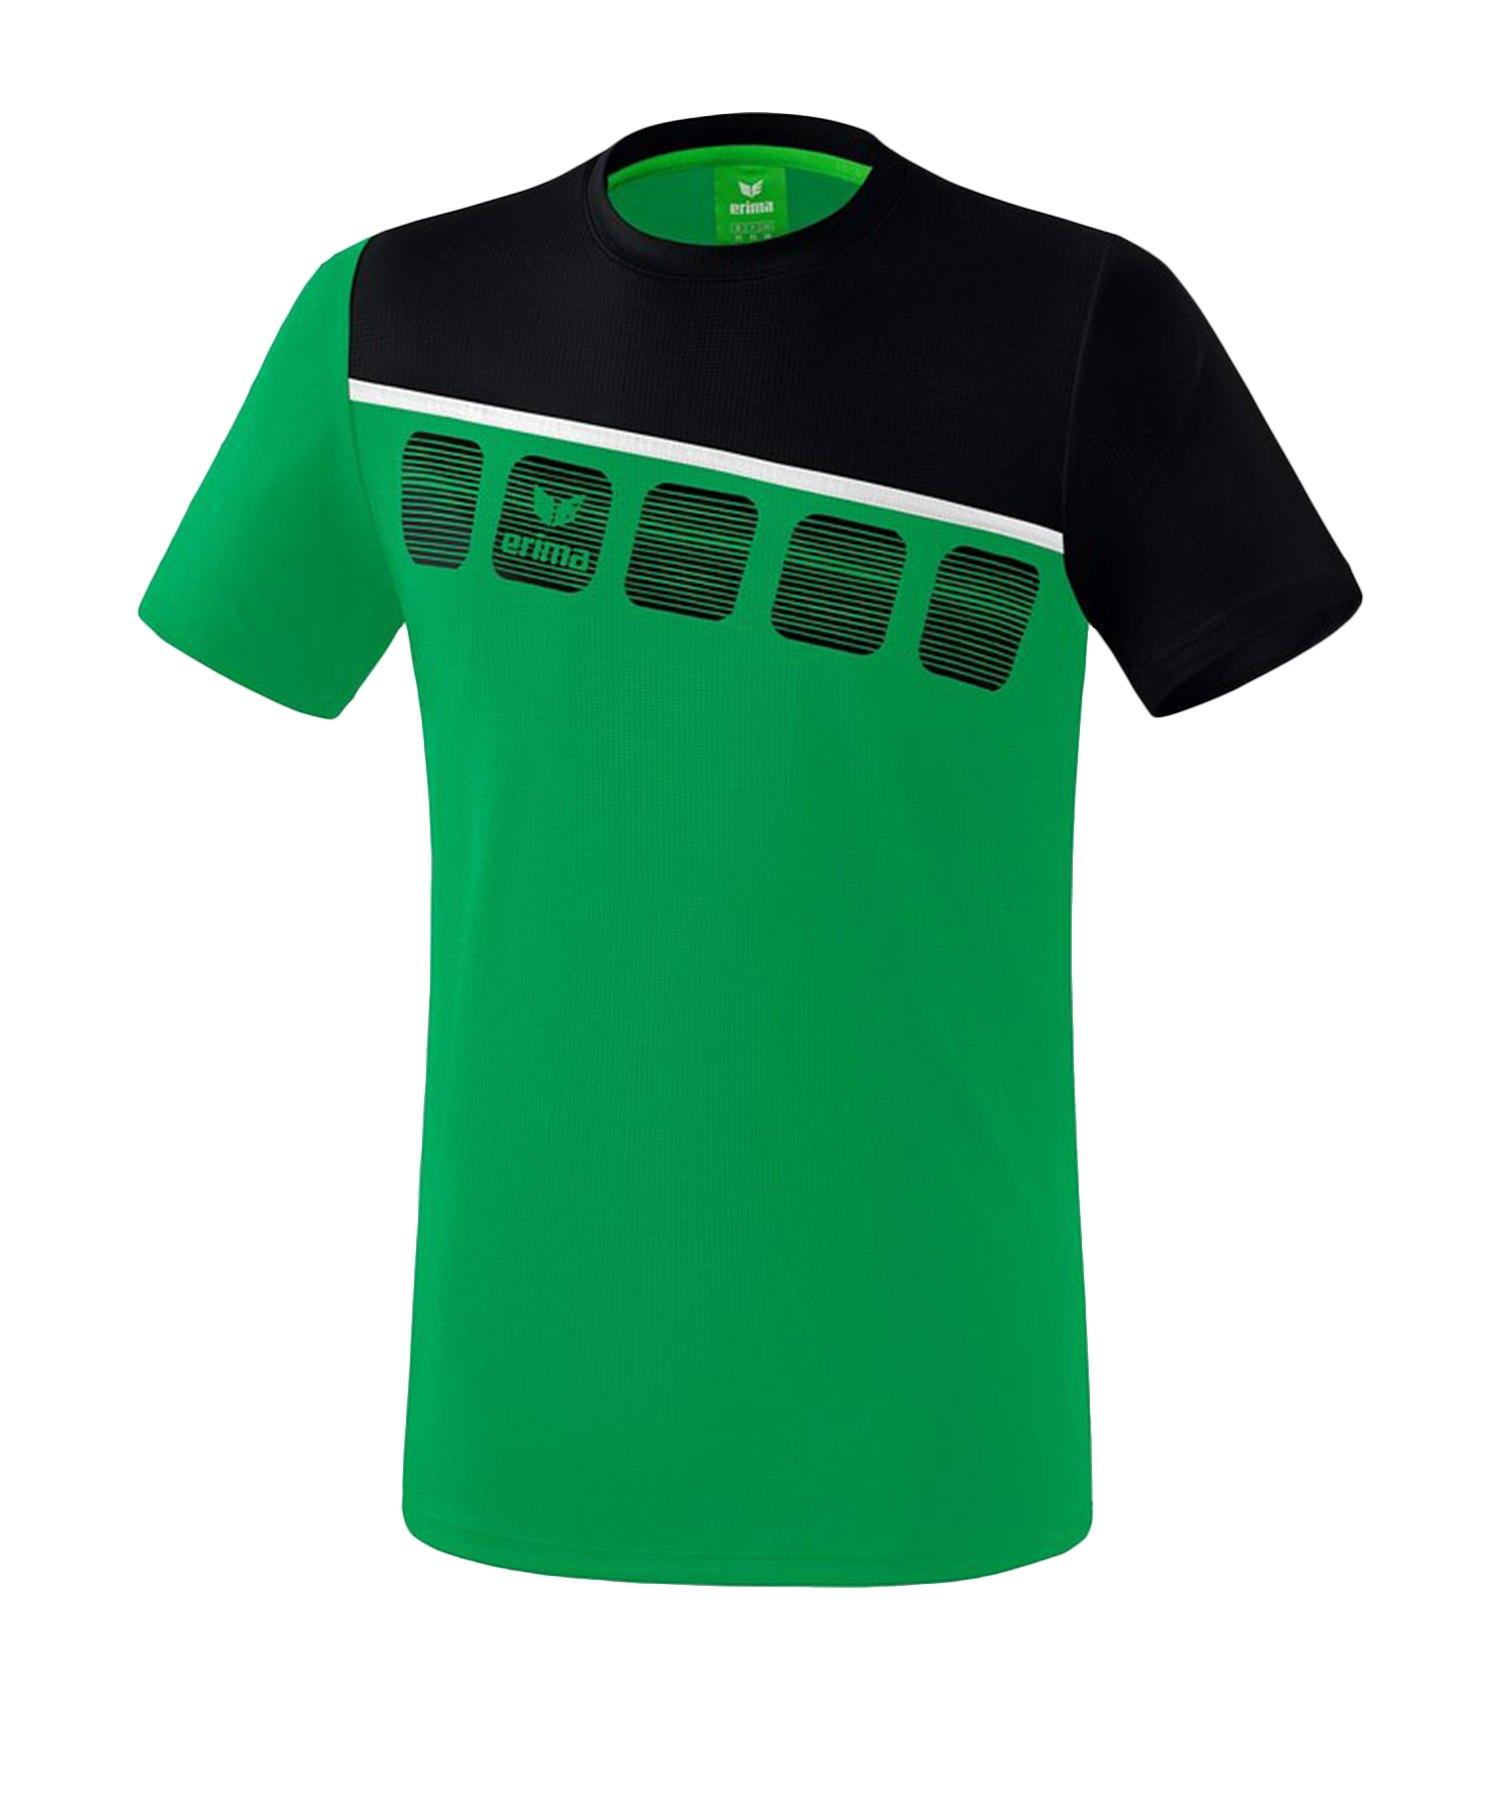 Erima 5-C T-Shirt Kids Grün Schwarz - Gruen